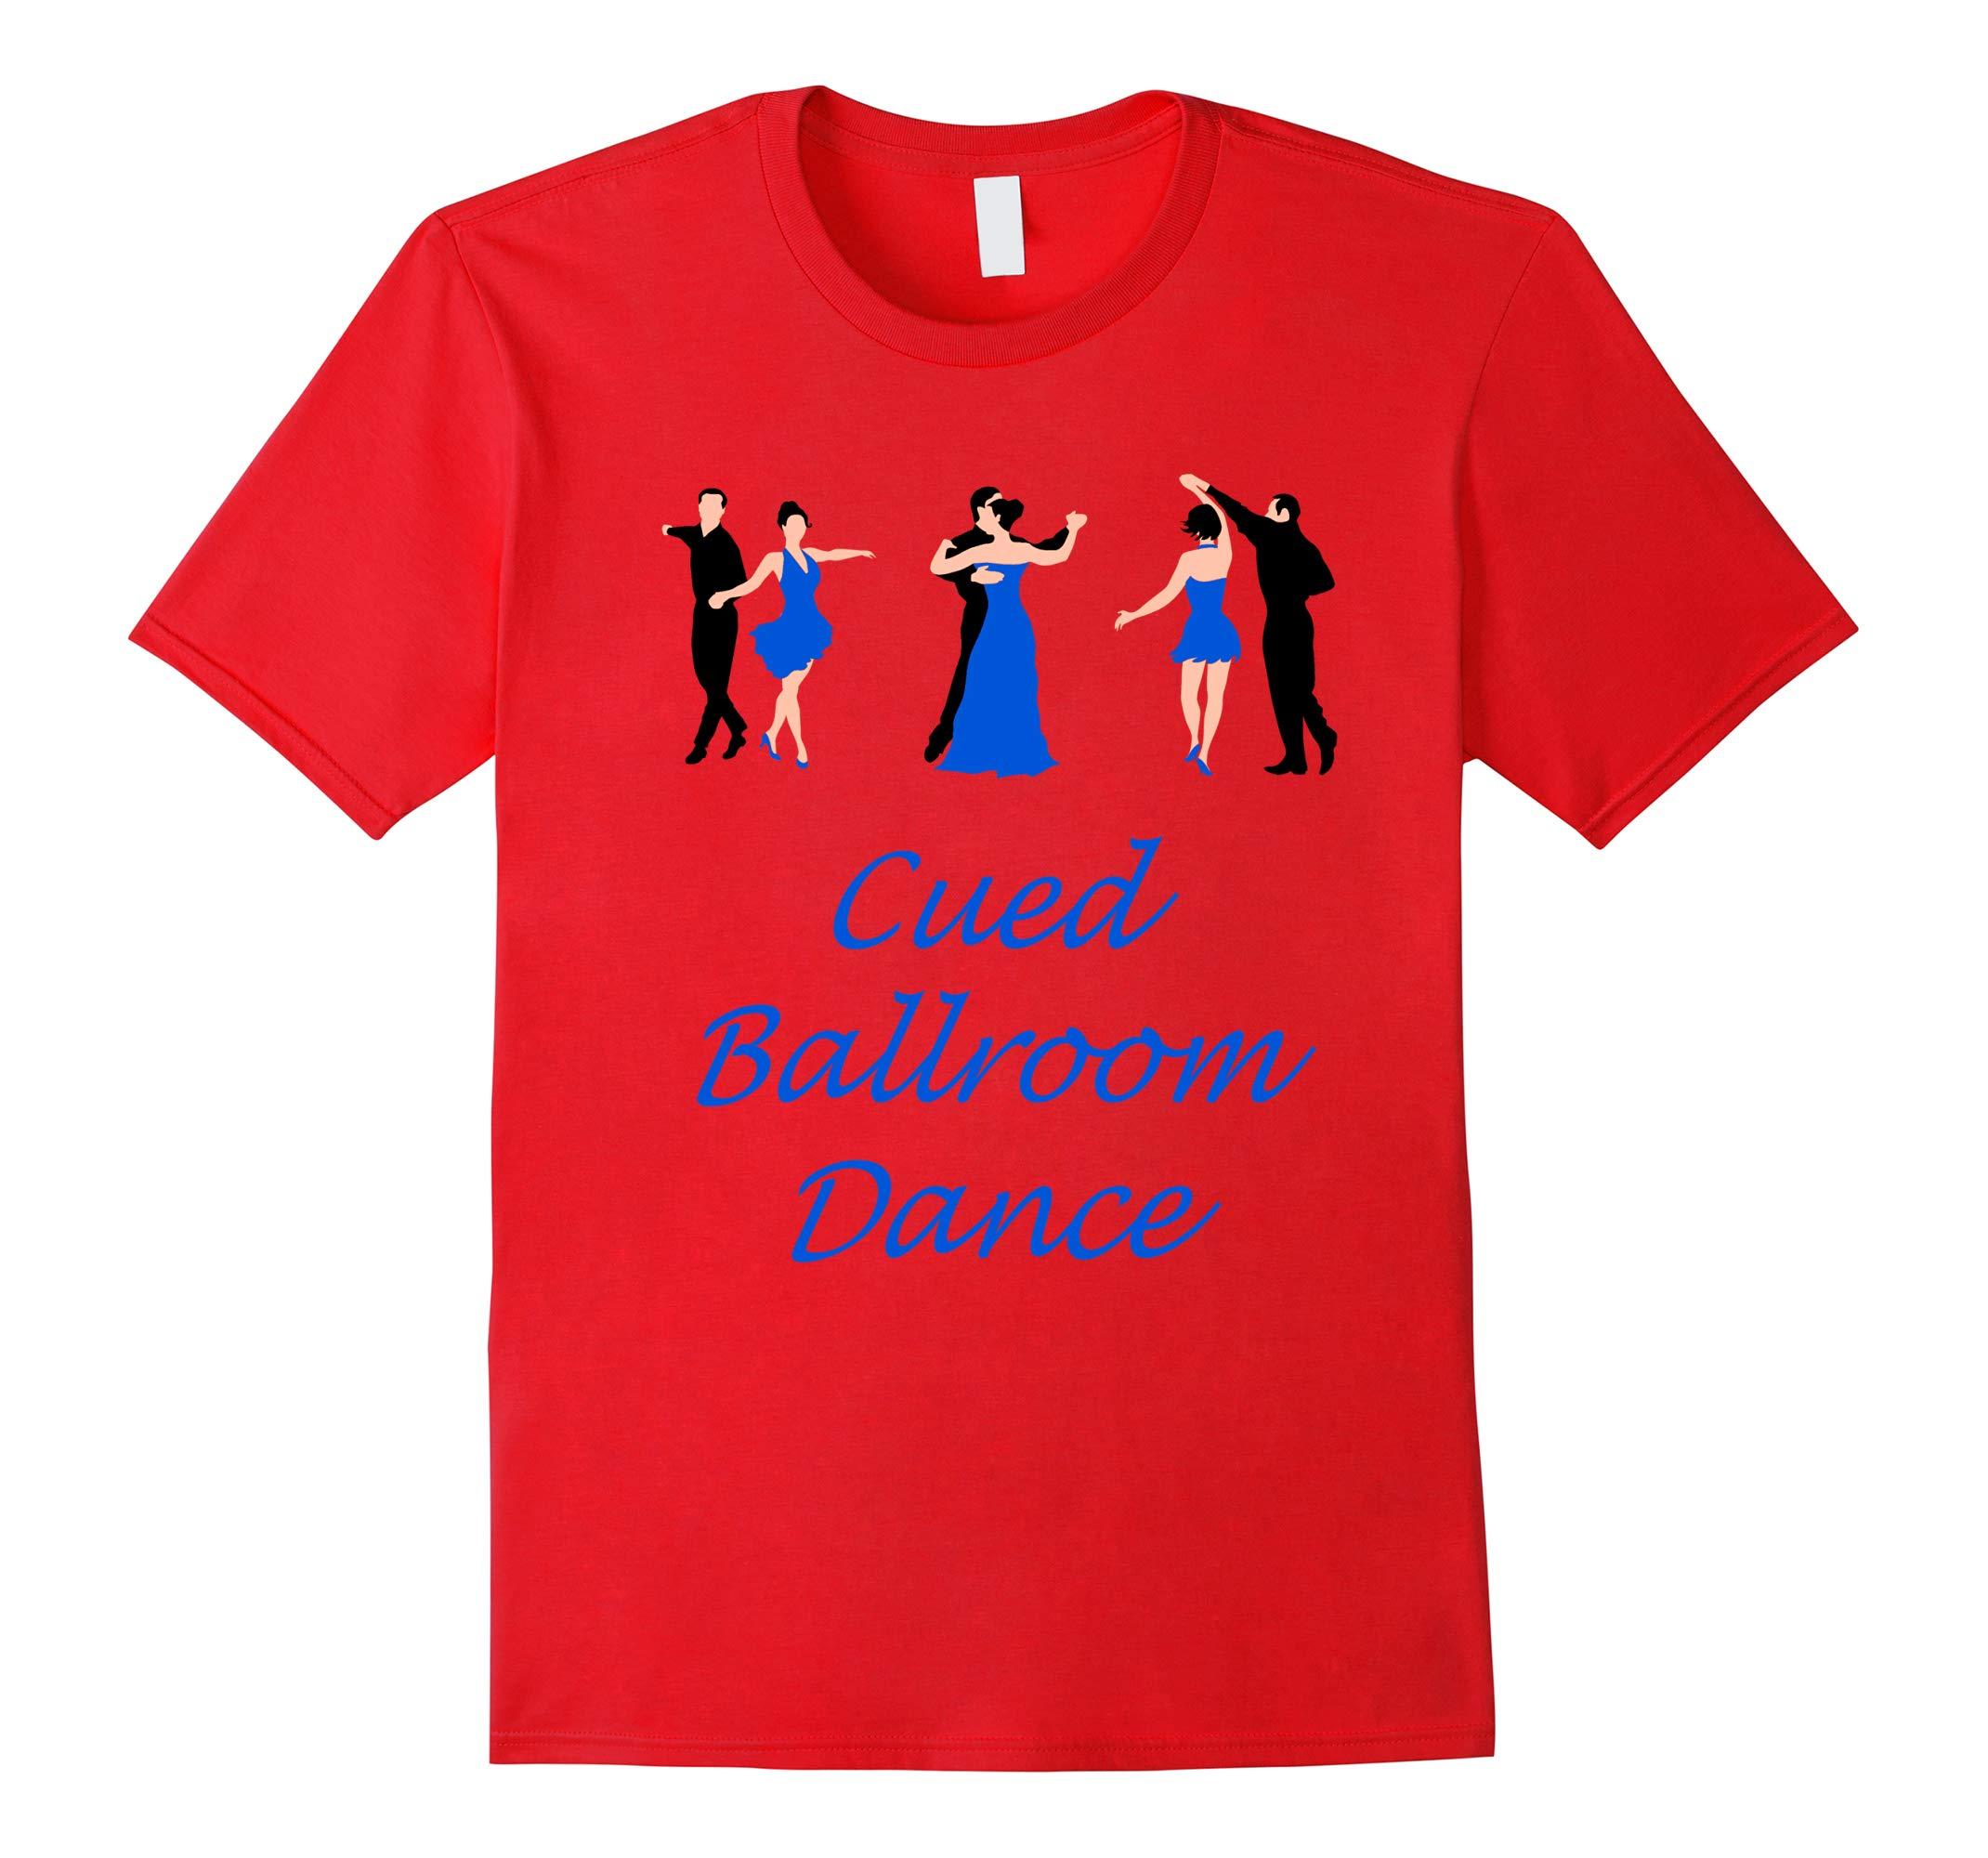 Cued Ballroom Dance T-shirt-RT